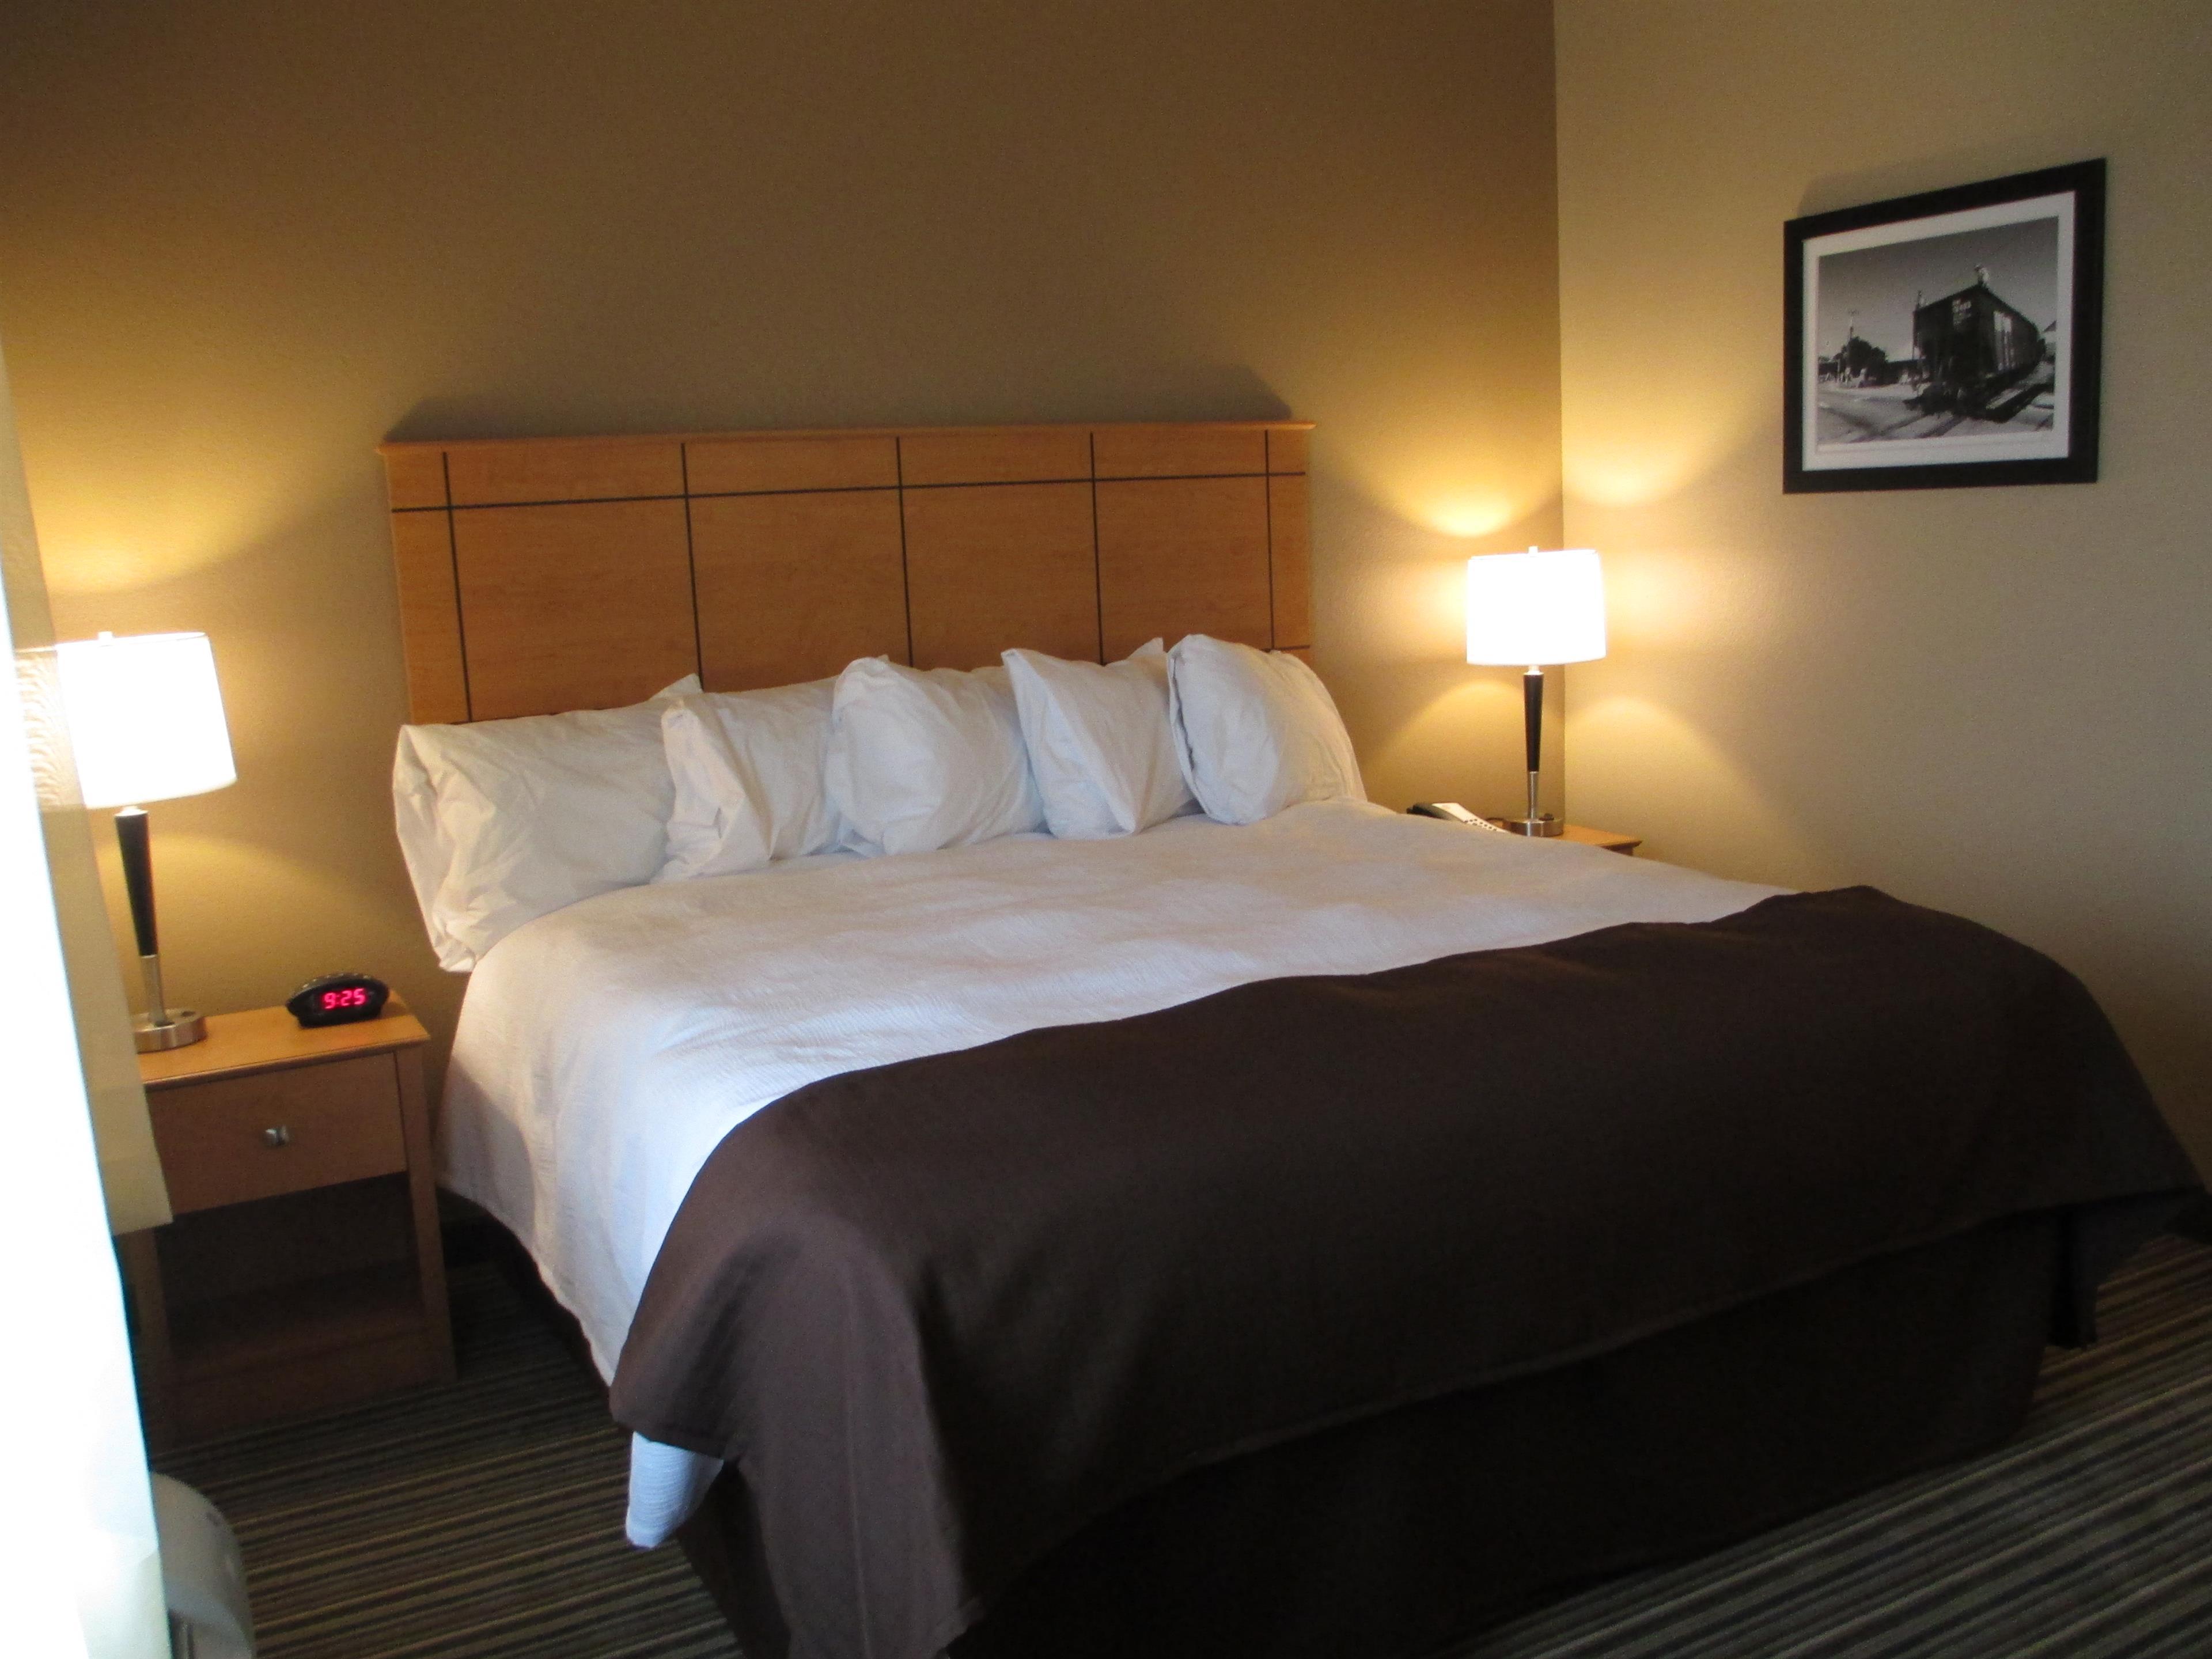 Best Western Shelby Inn & Suites, Shelby MT